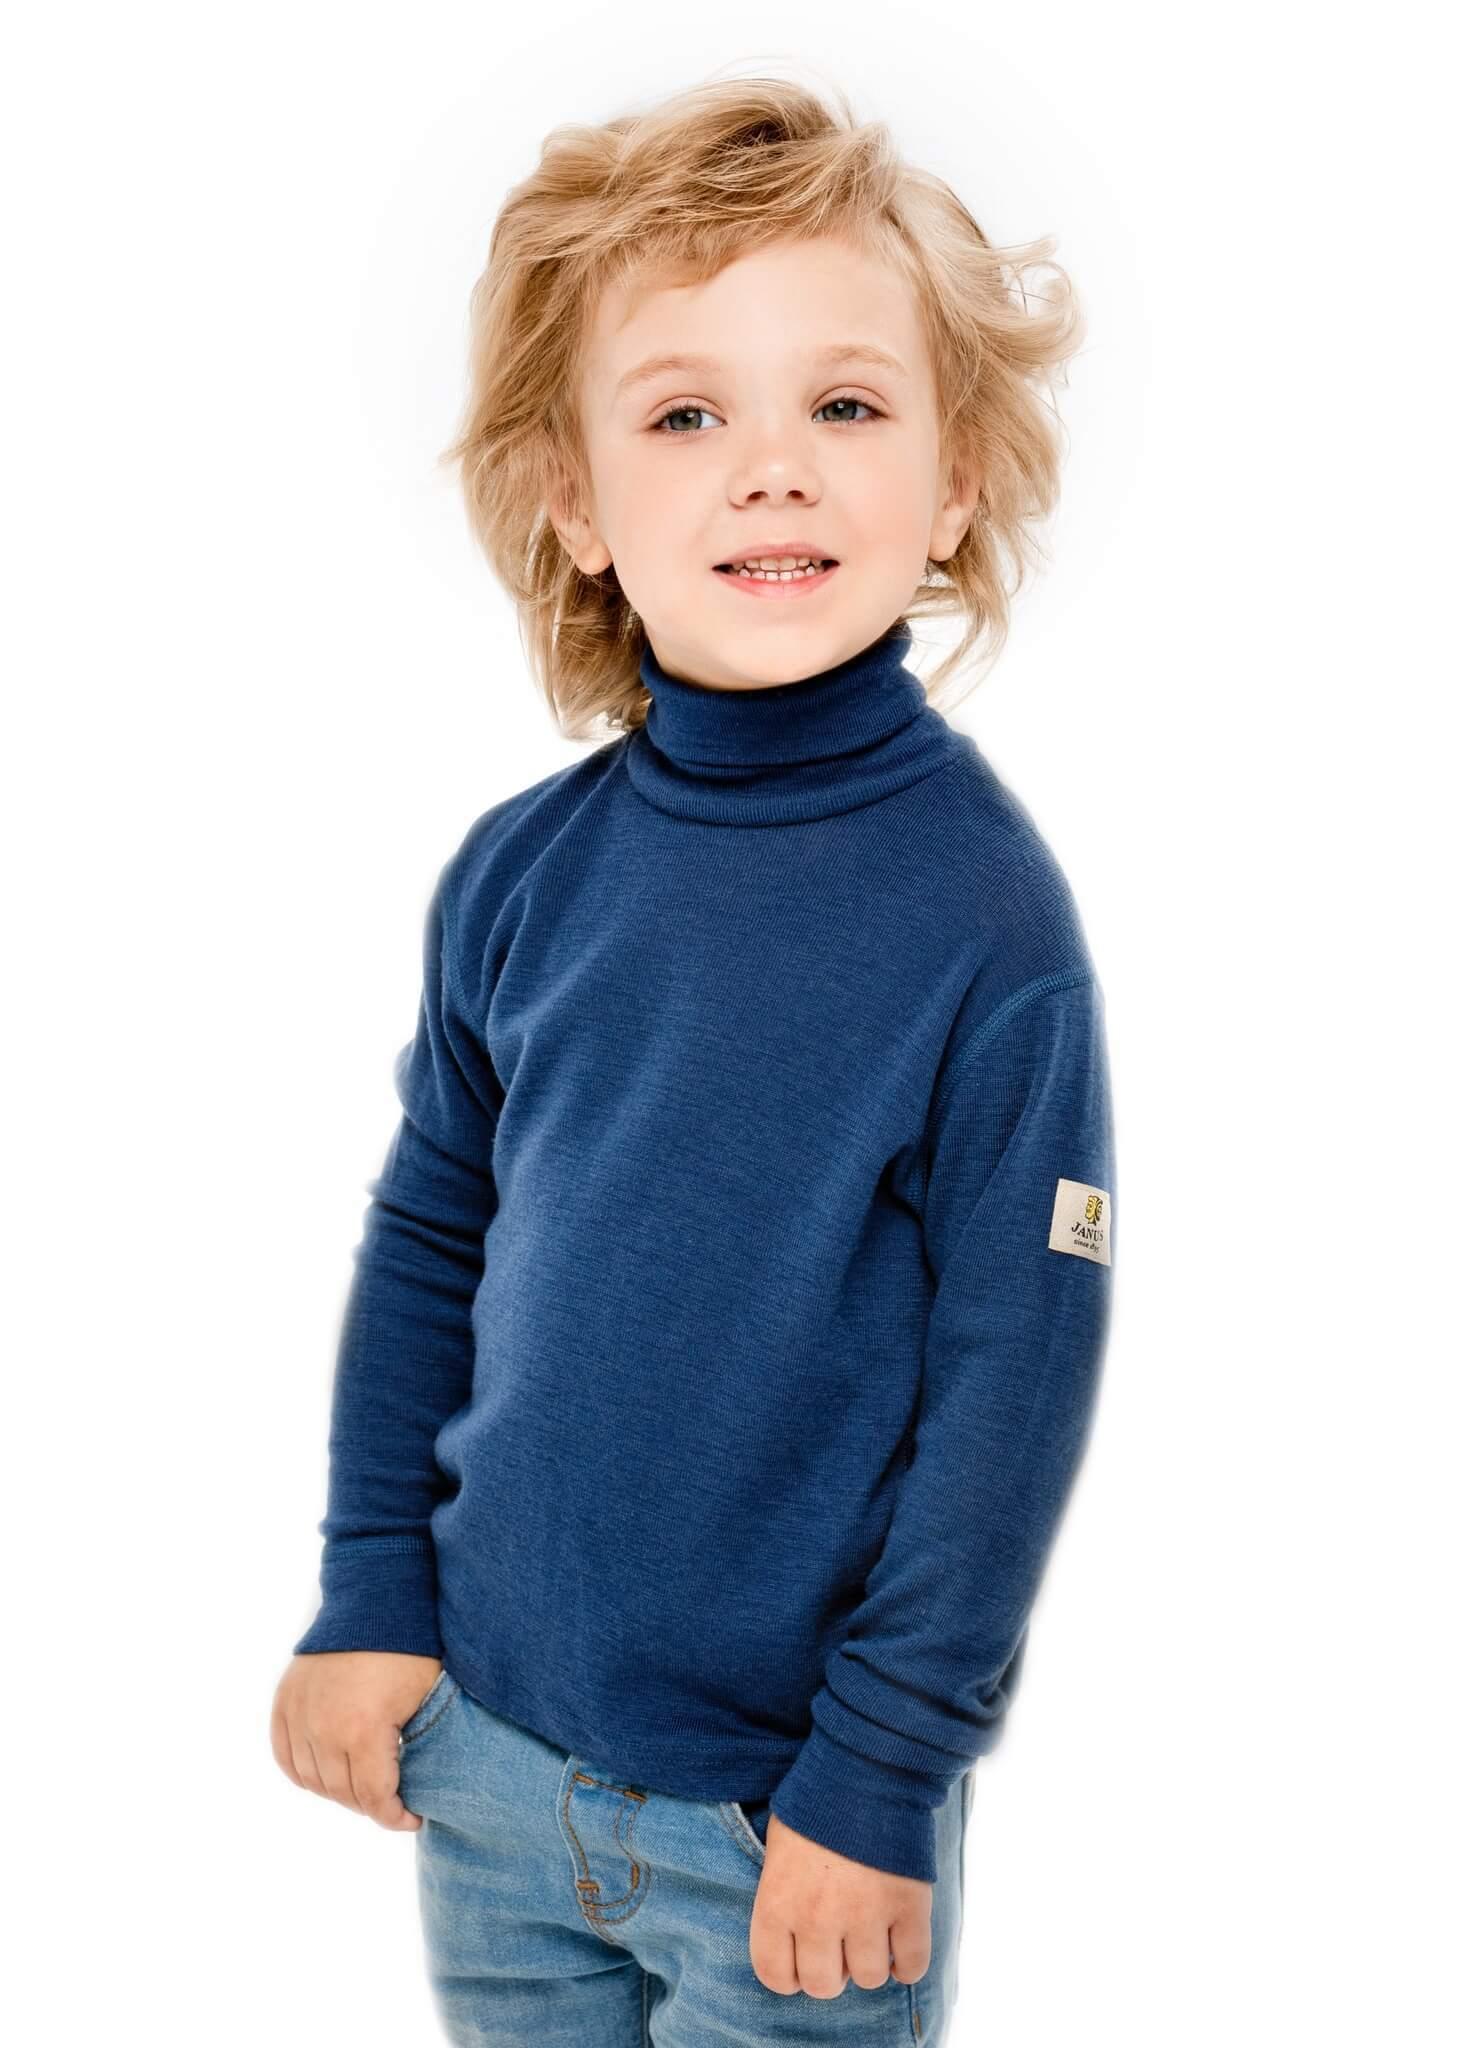 Janus Wool Merino детский комплект термобелья синий - 2